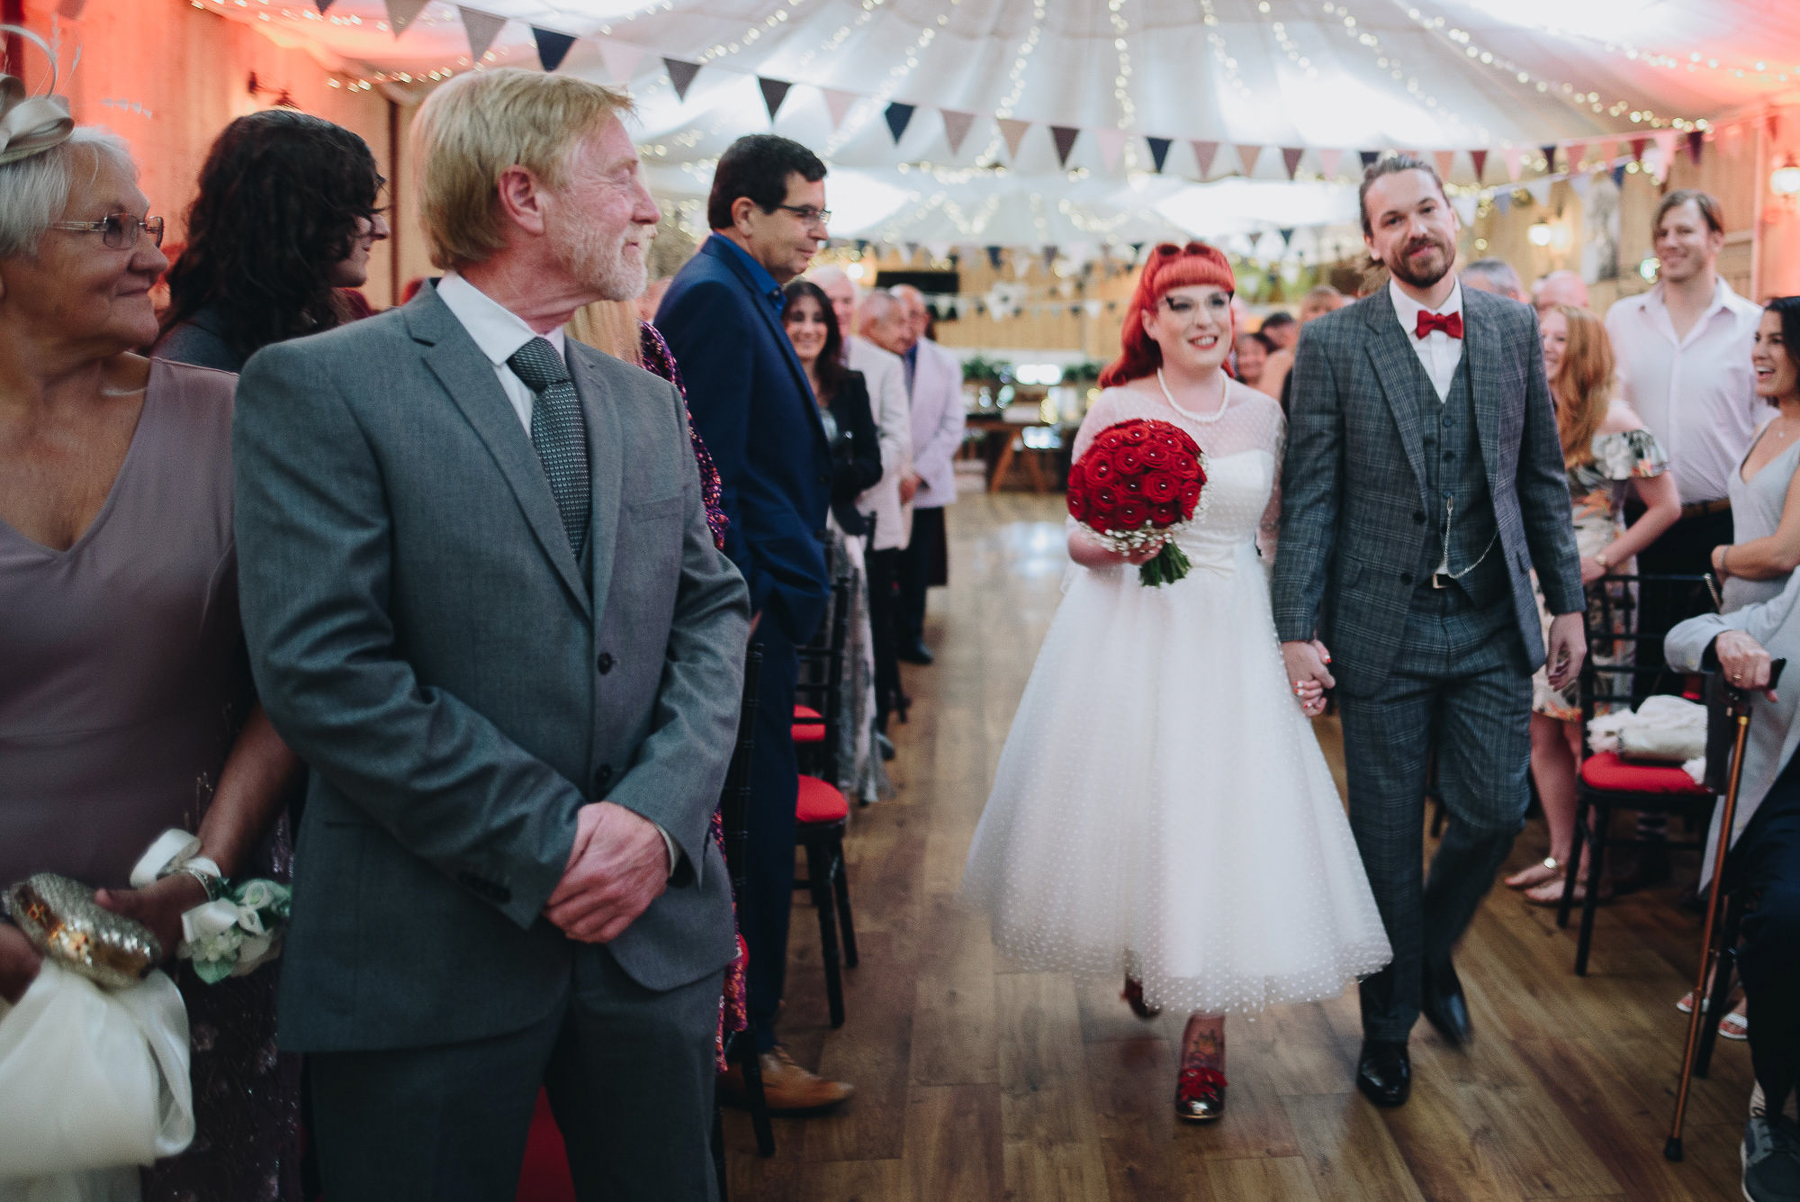 Wellbeing_Farm_Wedding_Photography_The_Pin-Up_Bride_Lara_Shaun-51.jpg